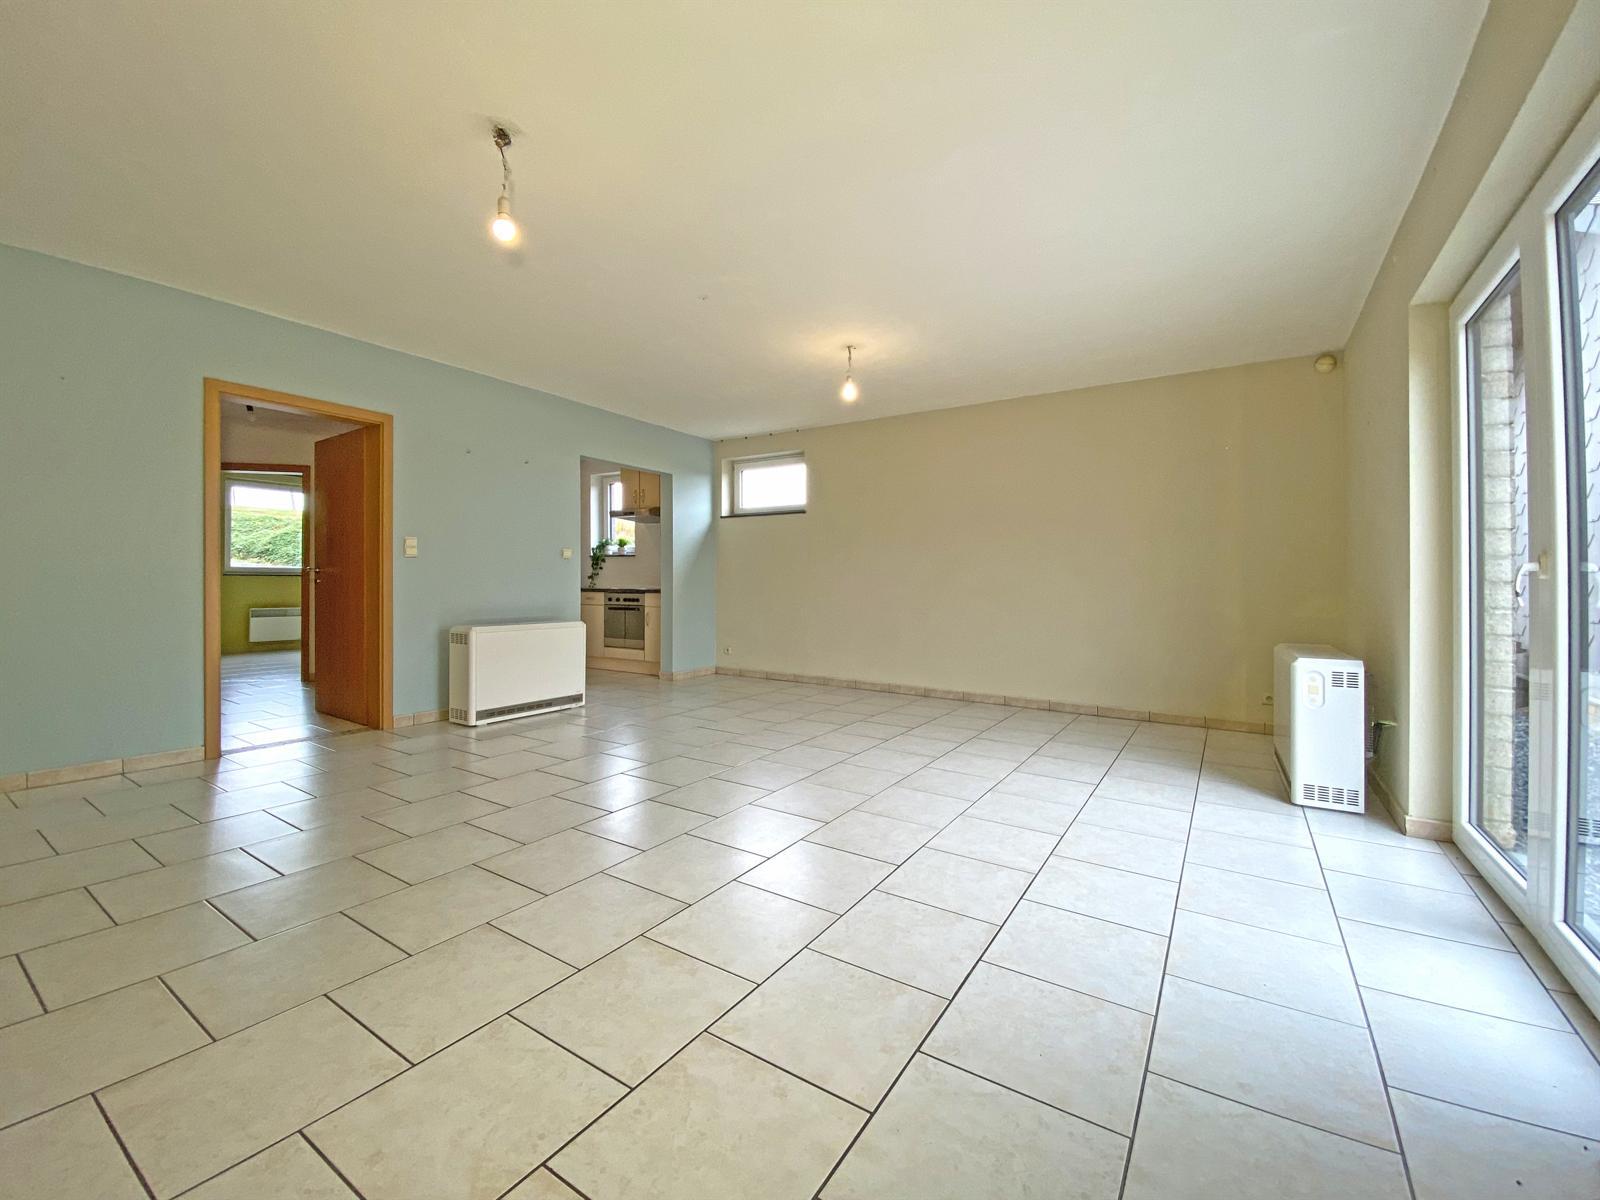 Appartement - Libramont-Chevigny - #4501598-2